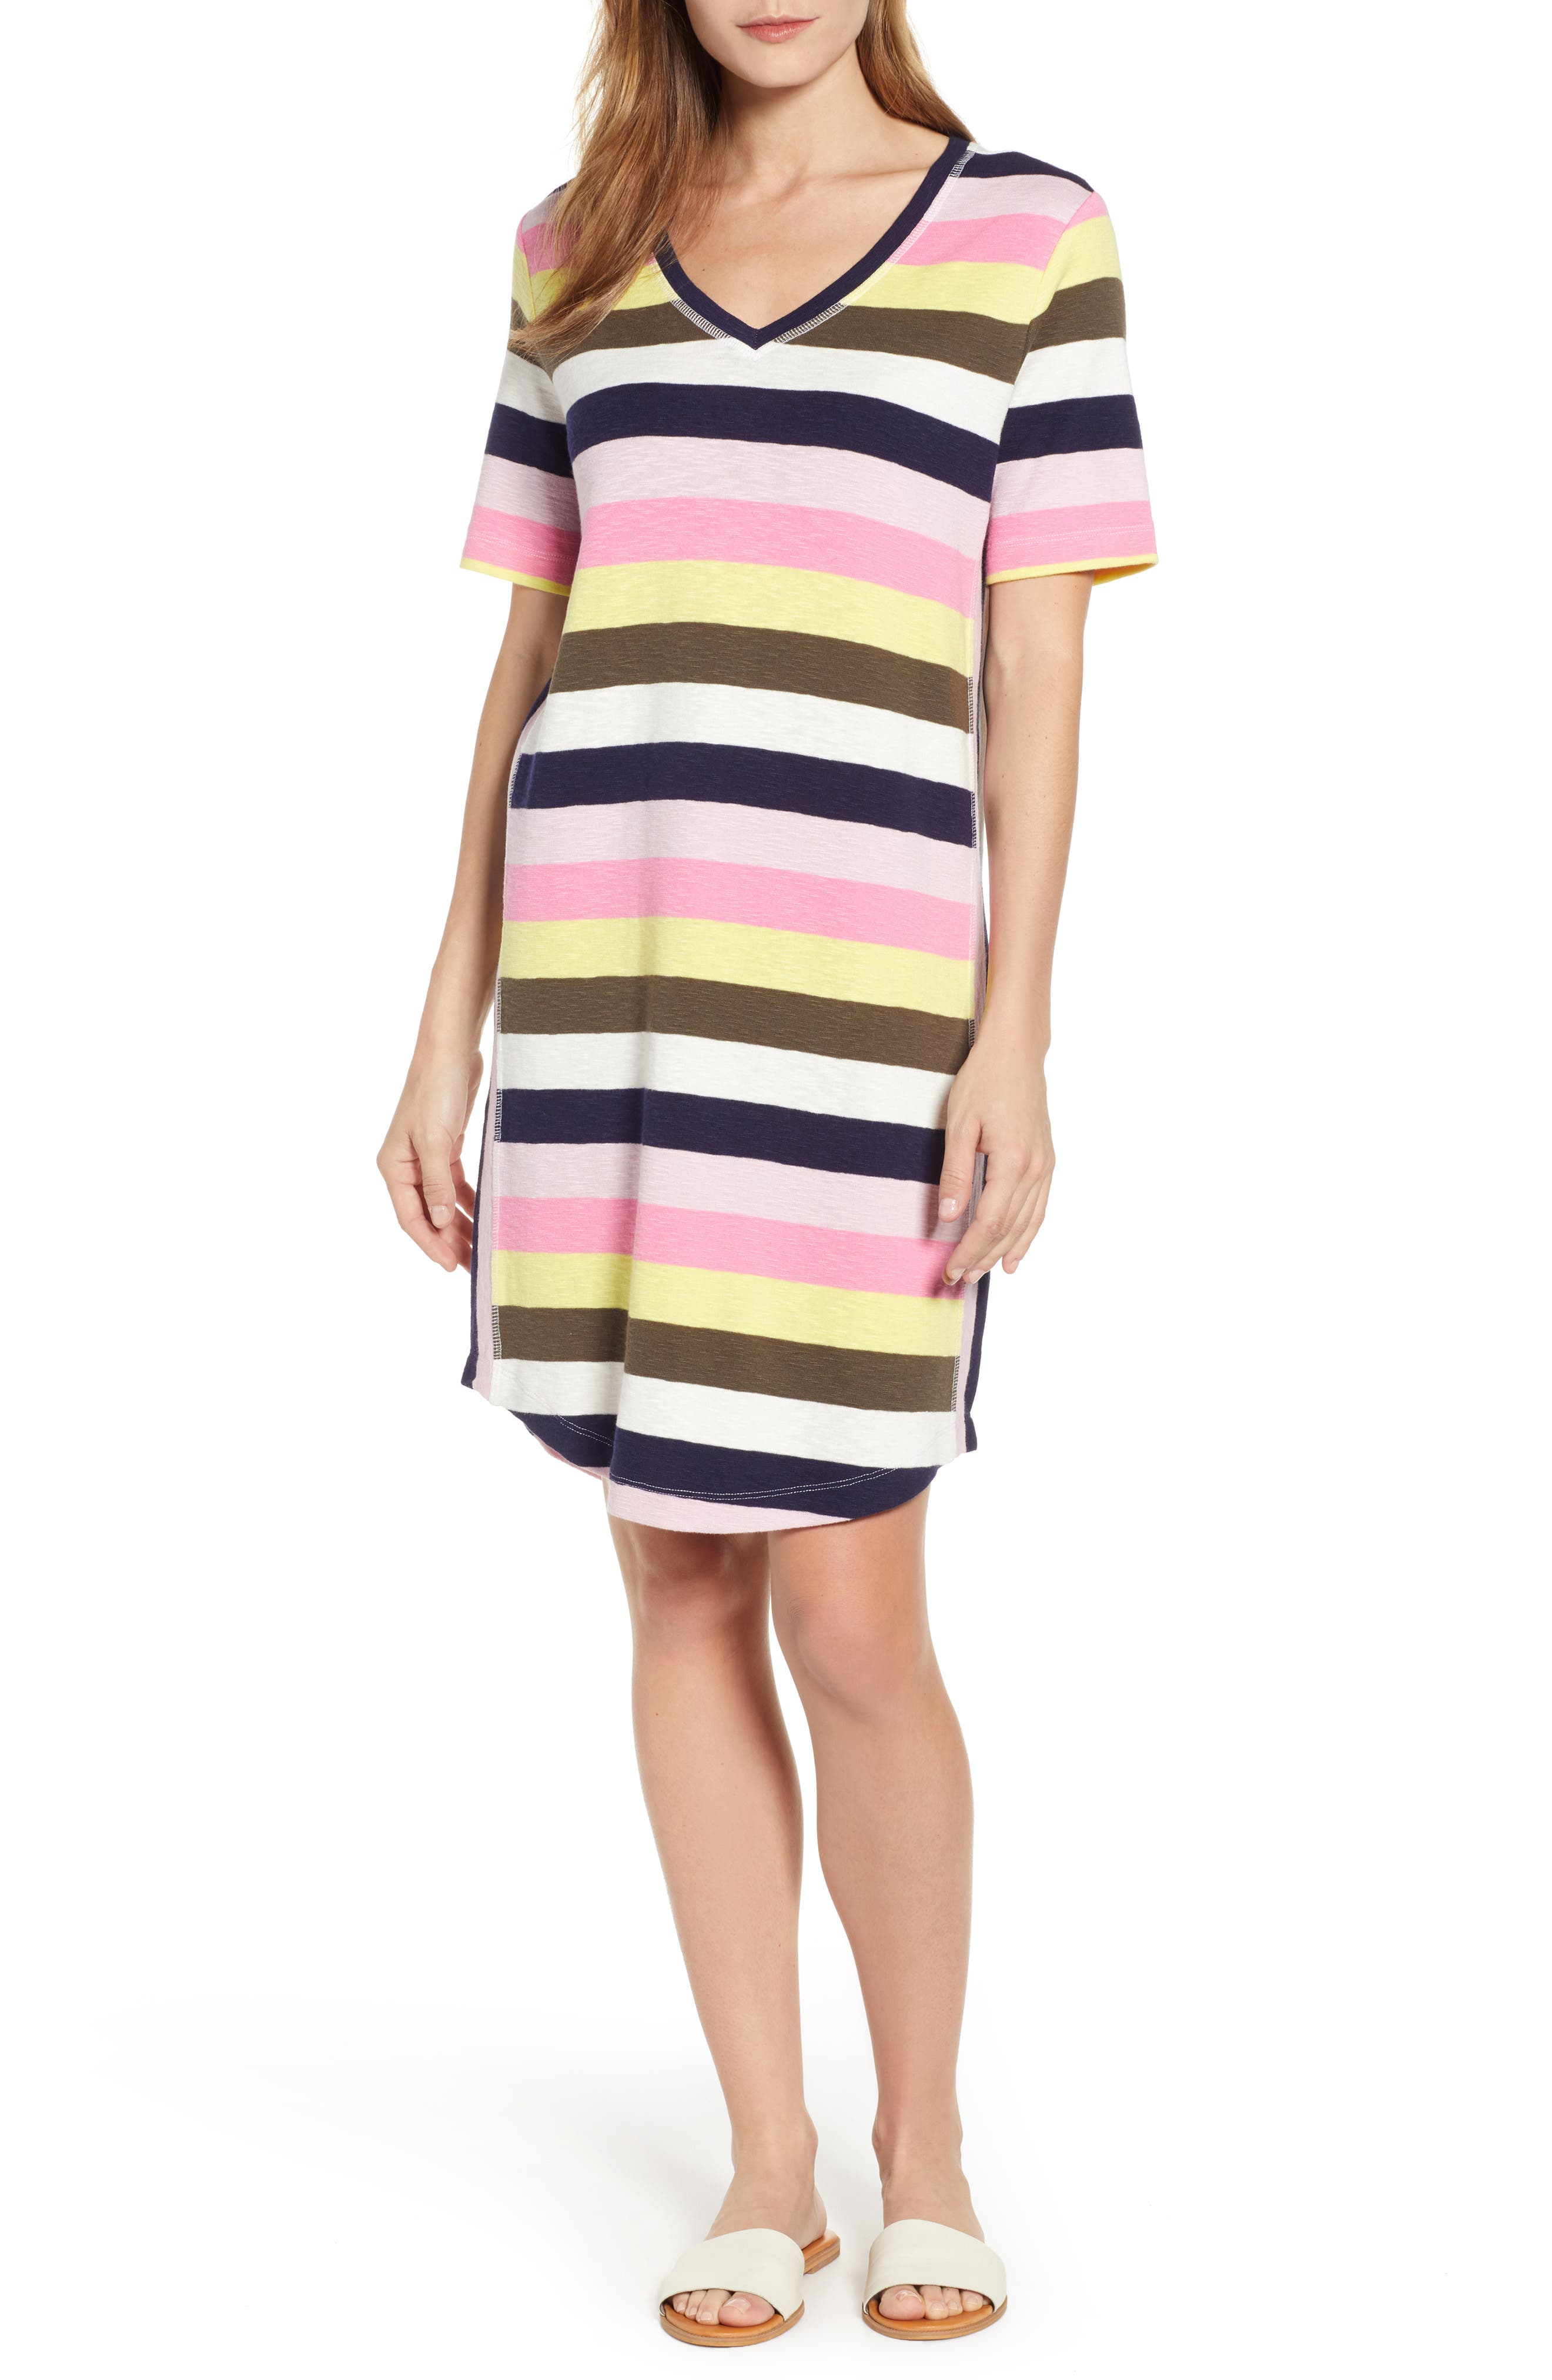 Petite Caslon Slub Knit Dress, Pink